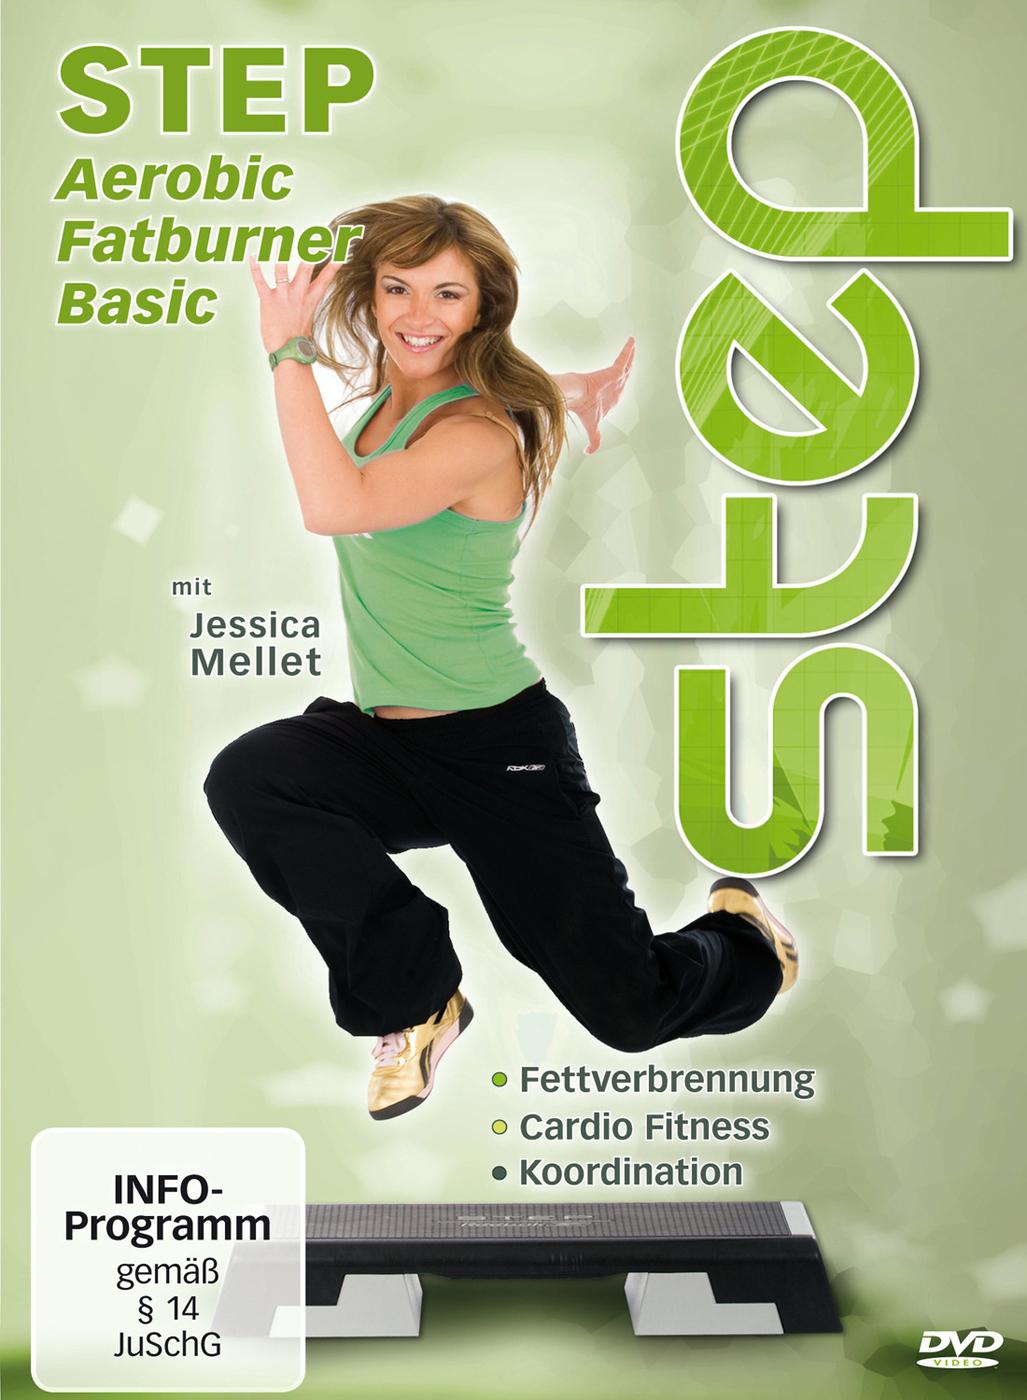 Step Aerobic Fatburner basic (DVD)